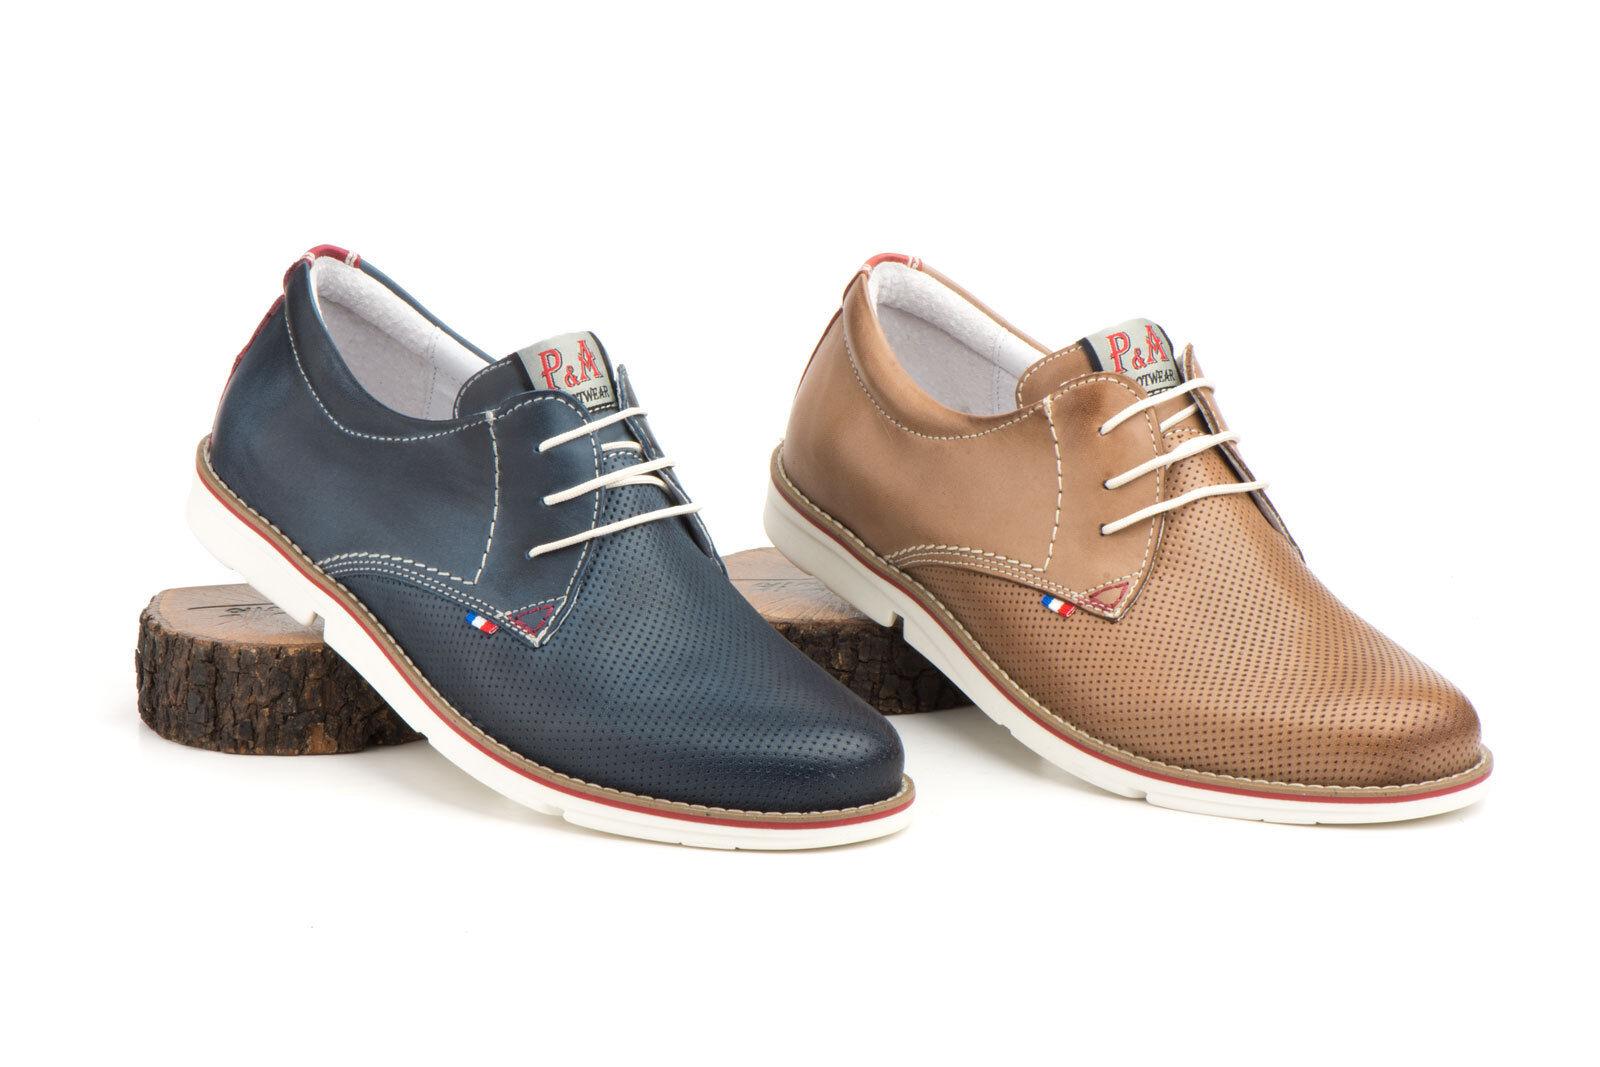 vente chaude en ligne a9f9a f2ebf 43 42 41 40 Taille marron Marine bleu Cuir Lacets Chaussures ...